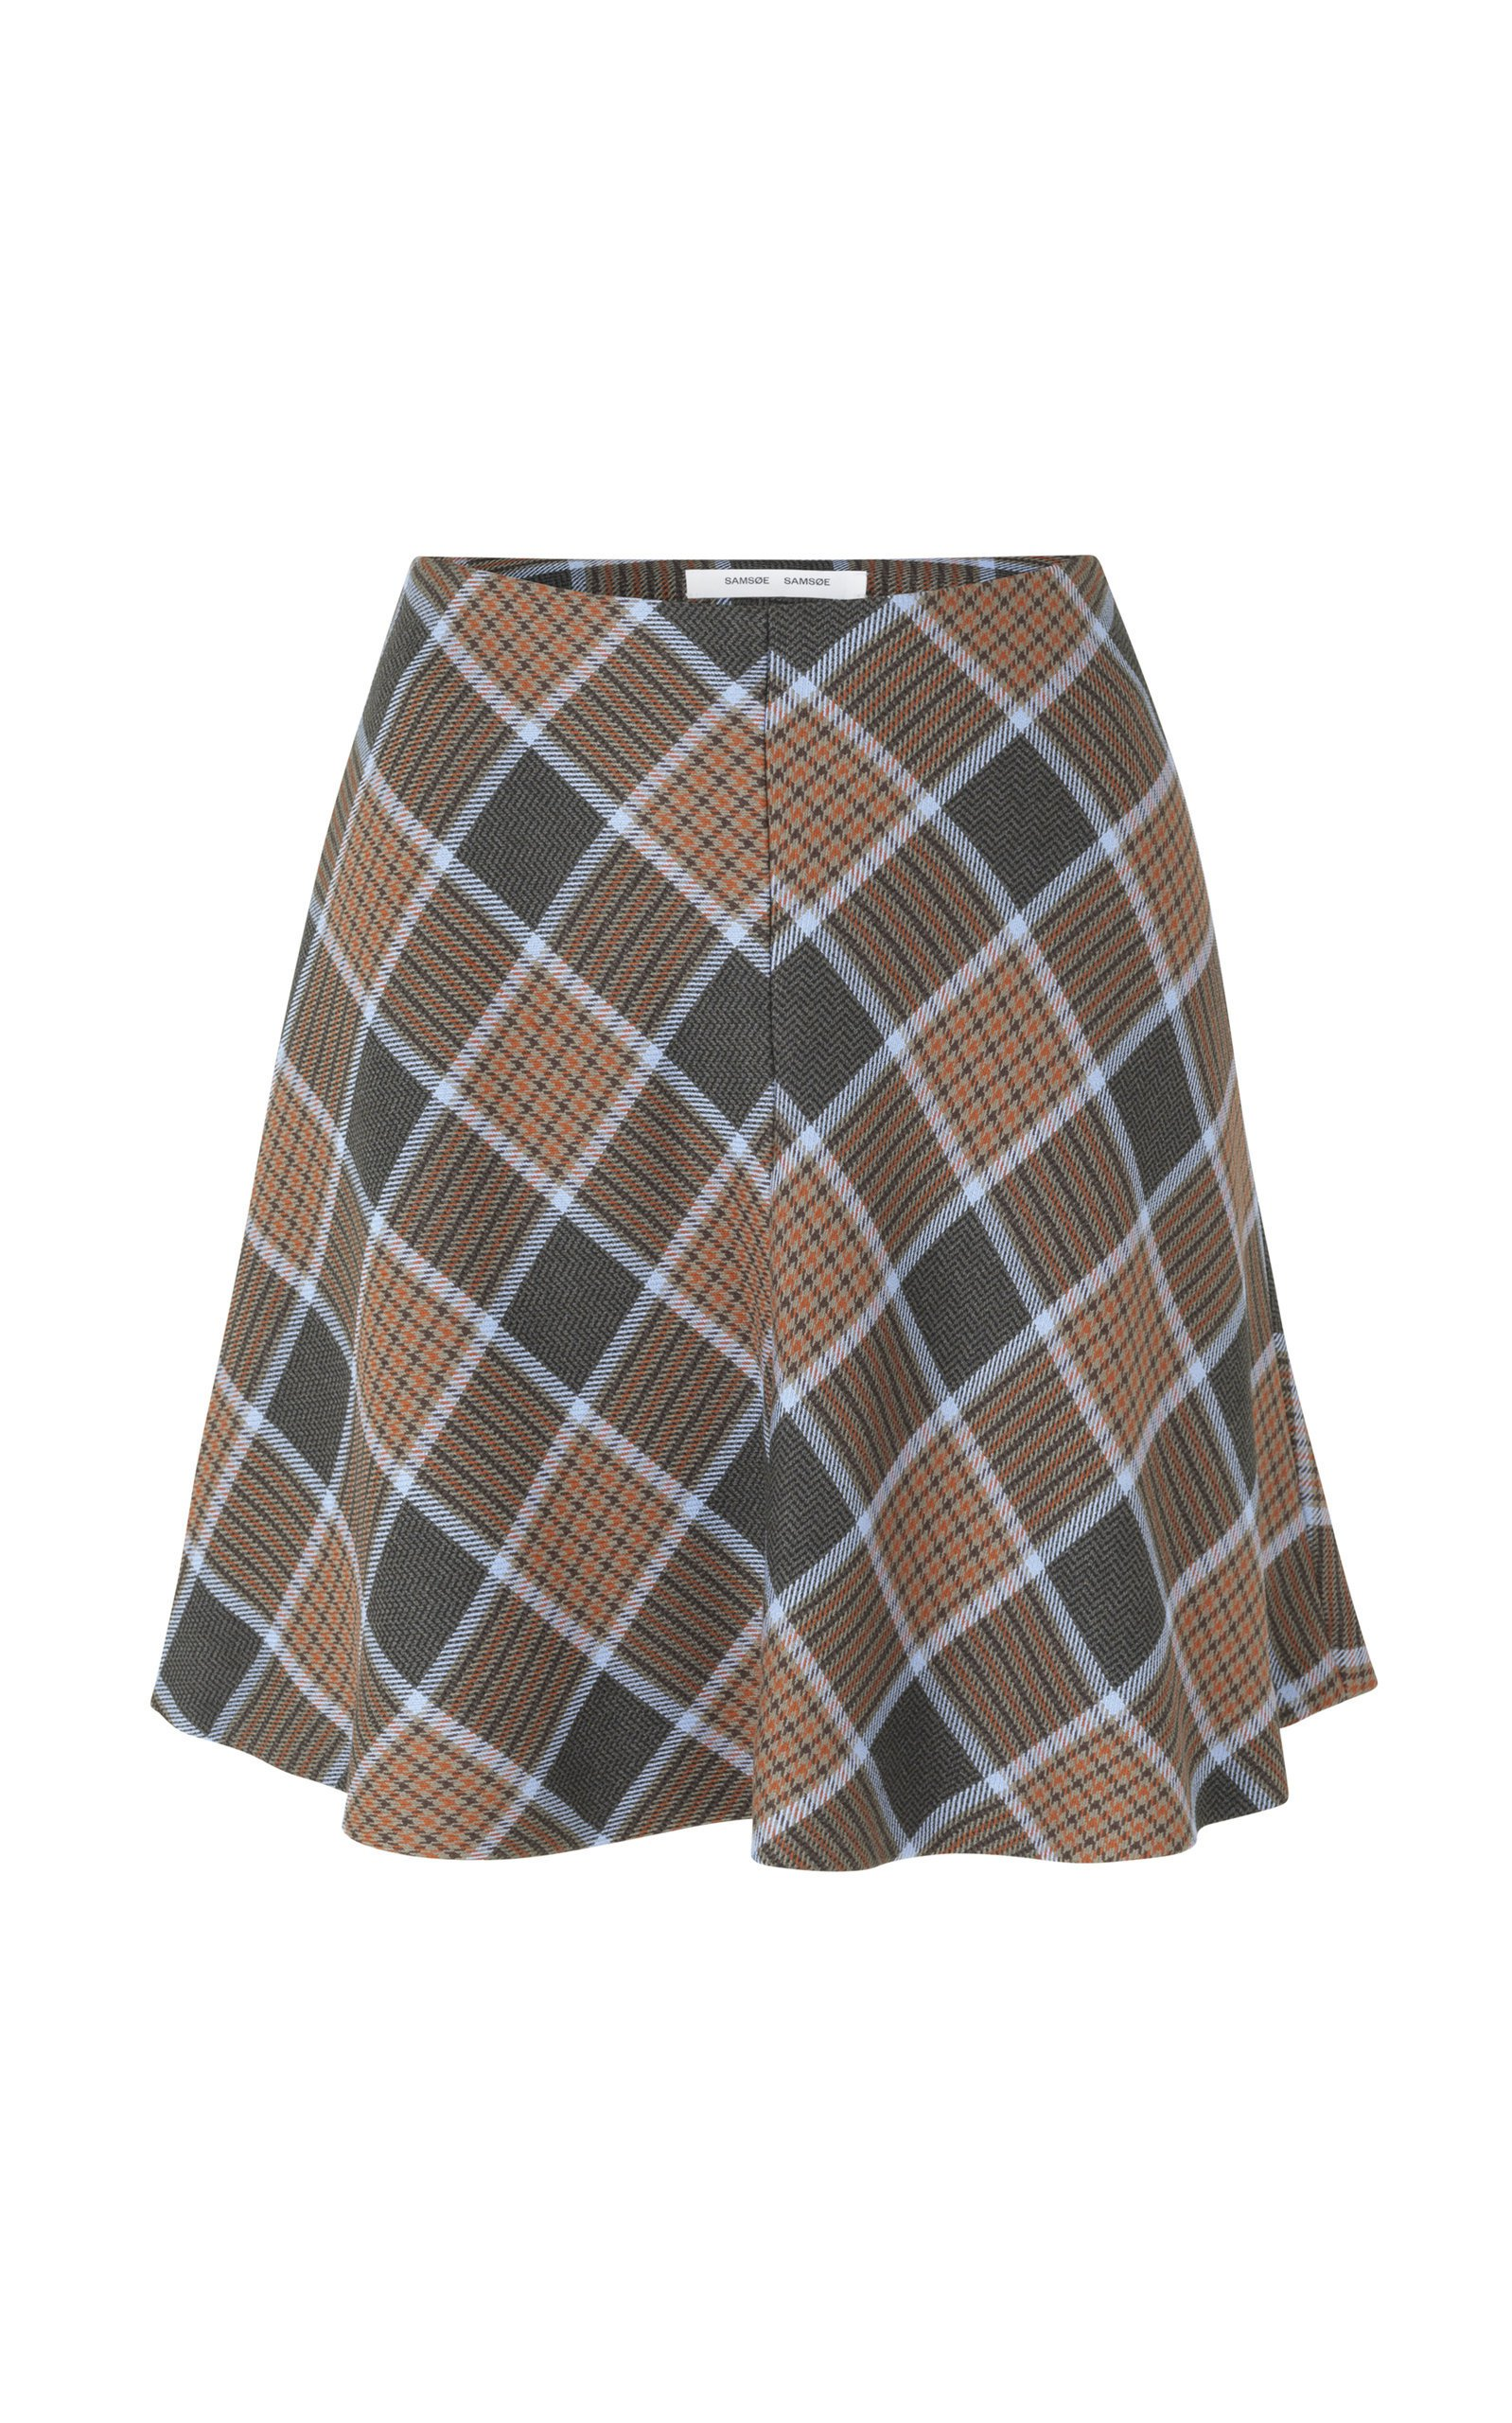 Samsøe Samsøe Kora Plaid Skirt Size: XS